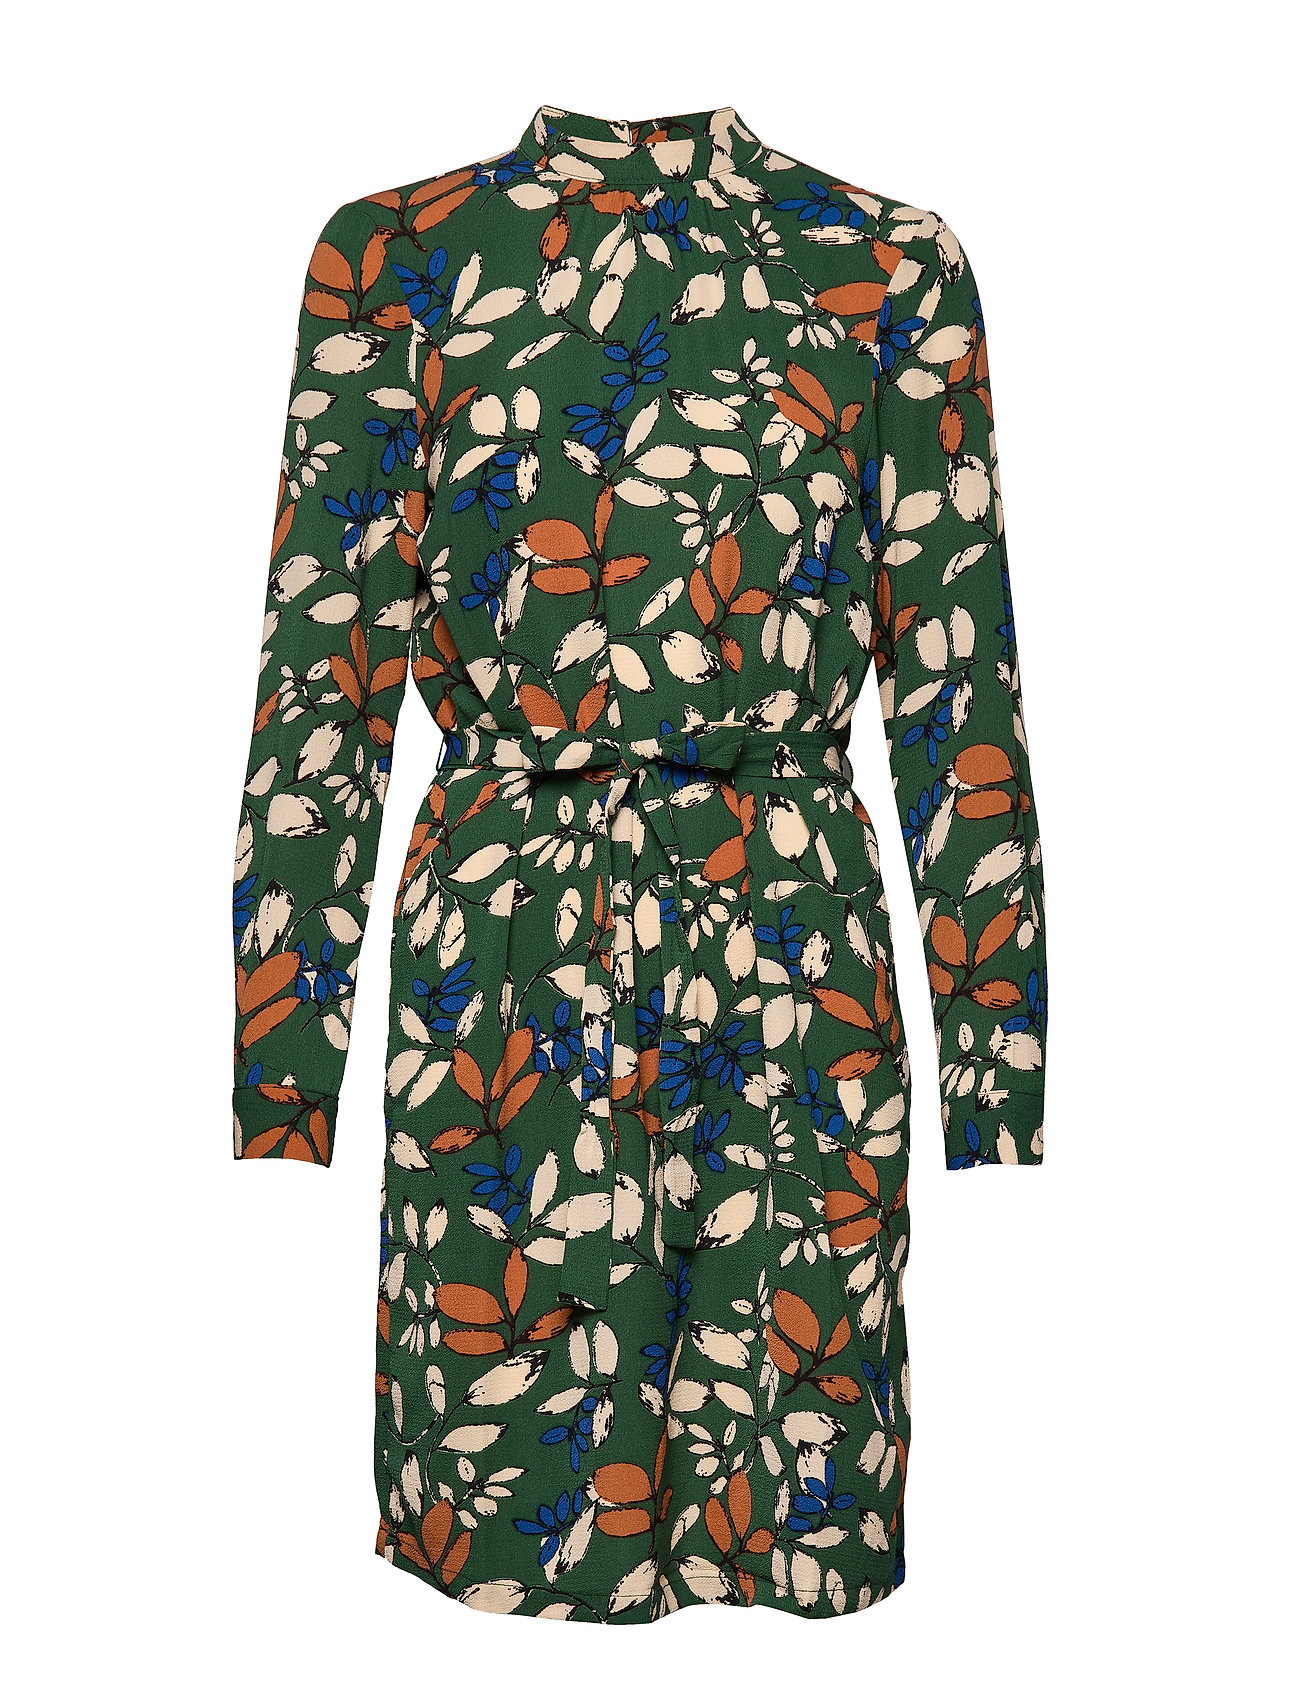 ONLY ONLNOVA LUX AOP HIGHNECK BELT DRESS 8 - PINENEEDLE